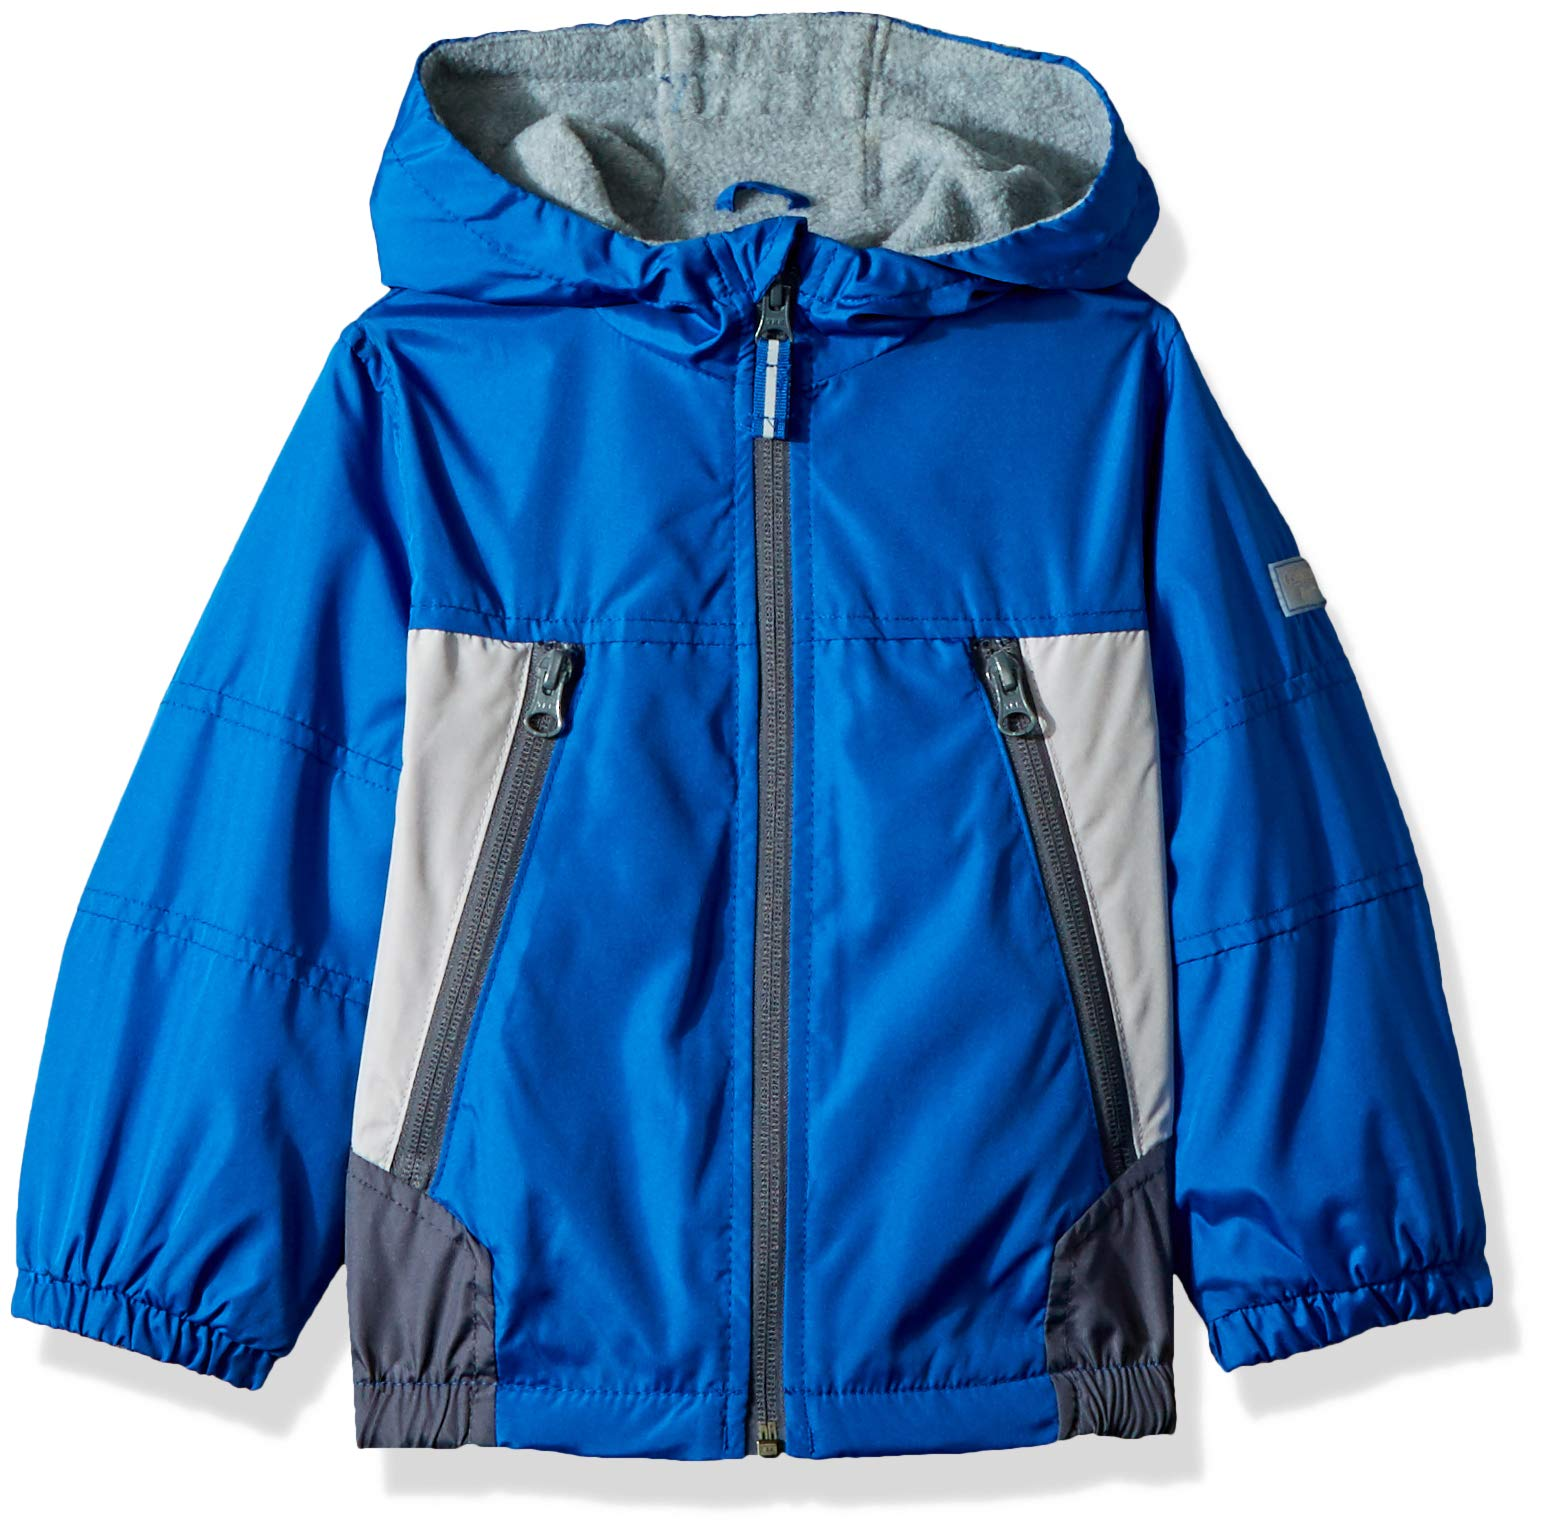 Osh Kosh Toddler Boys' Great Midweight Jacket, Cosmic Cobalt/Silver/Grey, 3T